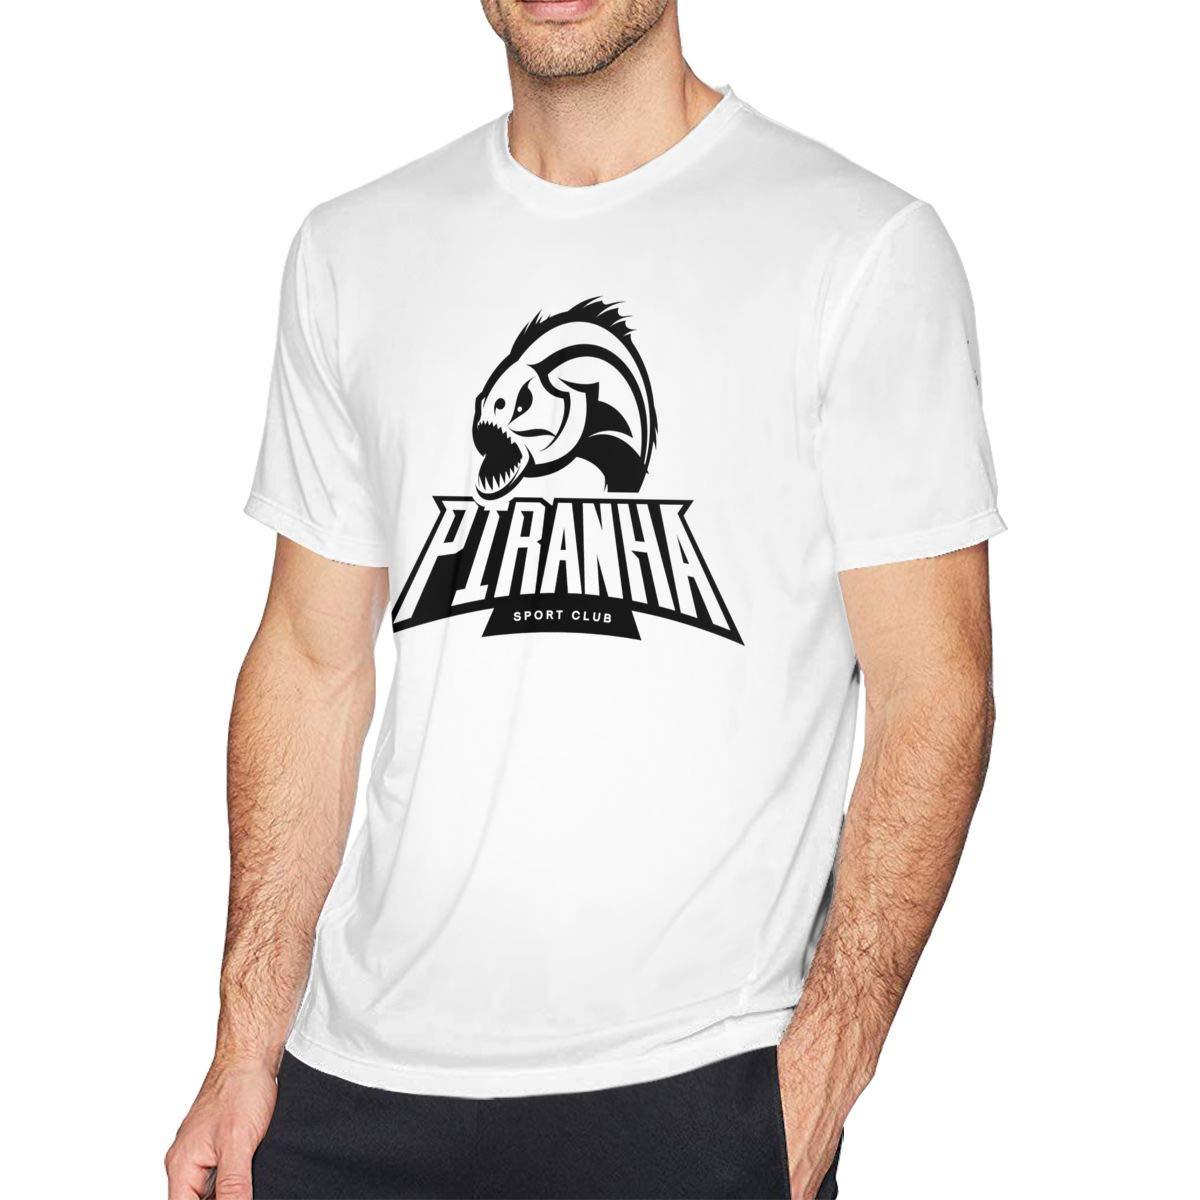 Bfcxbgdsig Piranha Logo Soft and Comfortable Fashionable Tshirt with Round Collar White